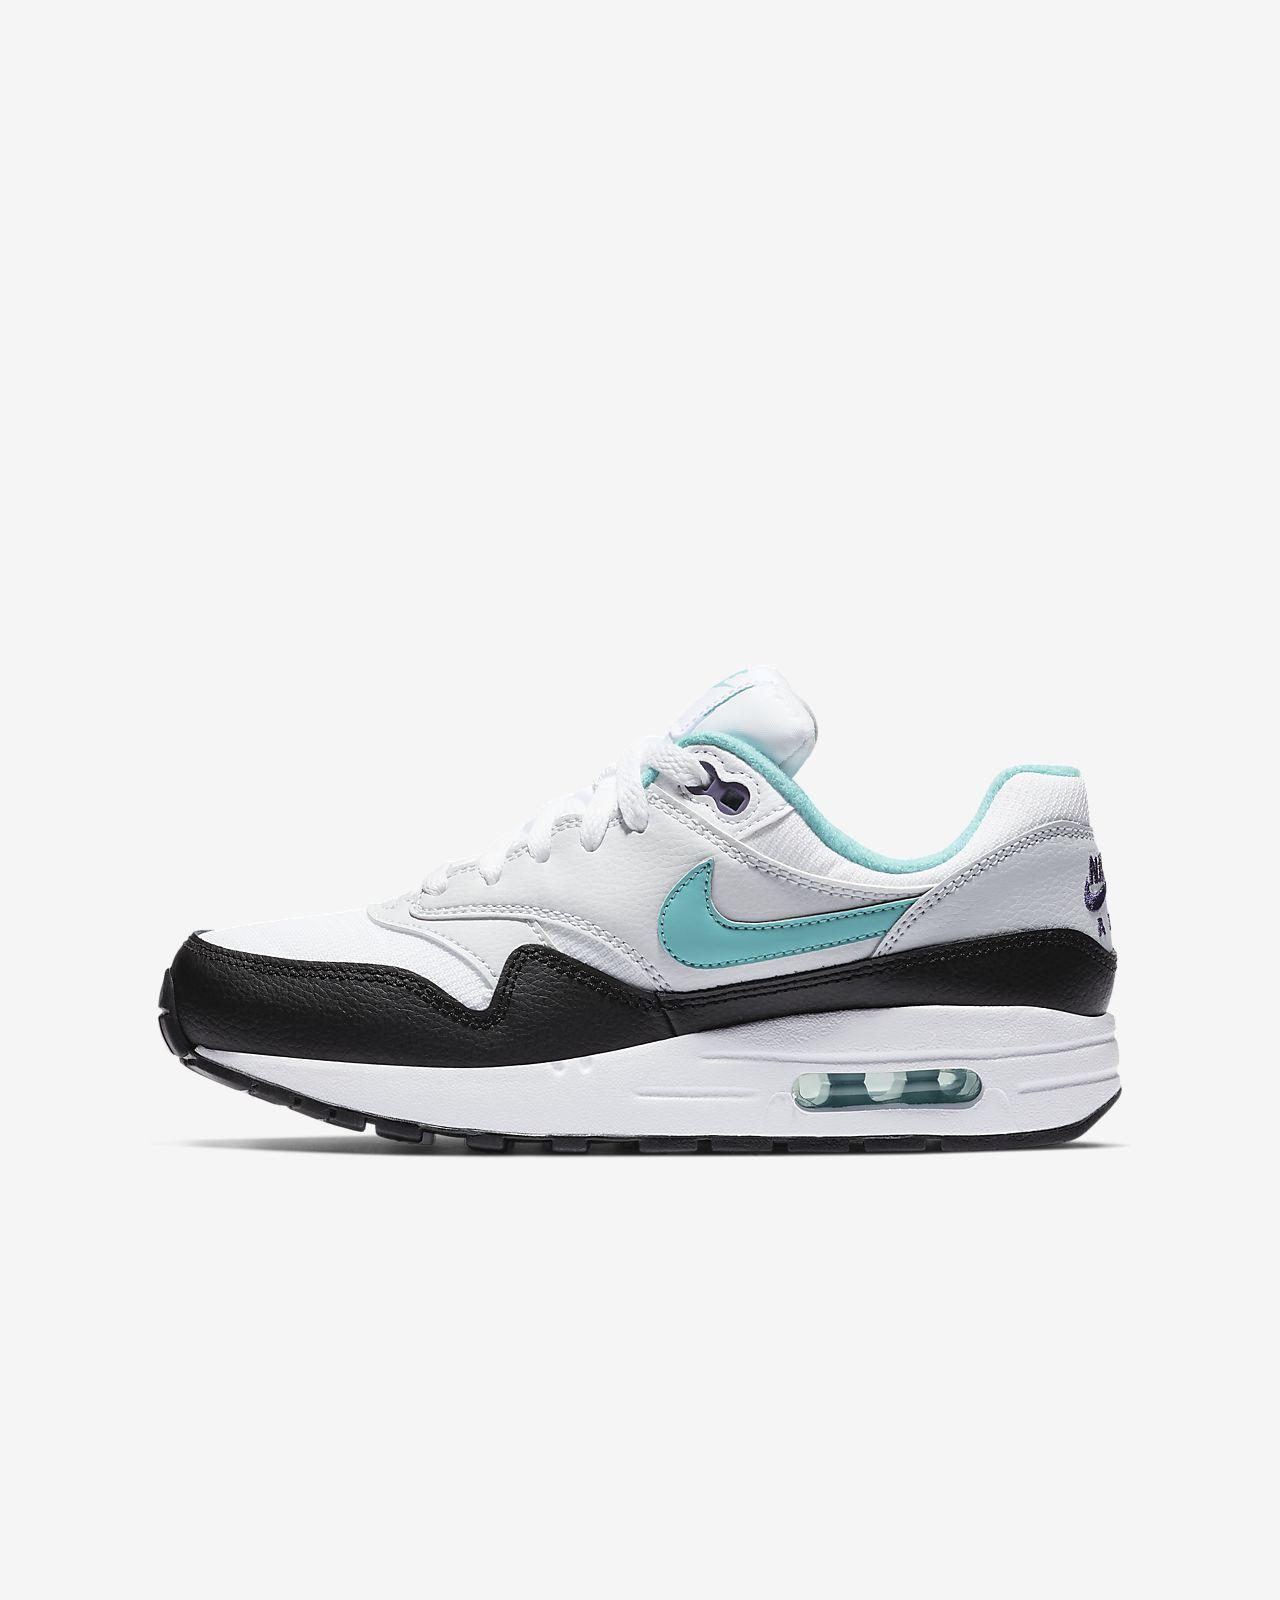 promo code e4242 d68df Nike Air Max 1 Big Kids  Shoe